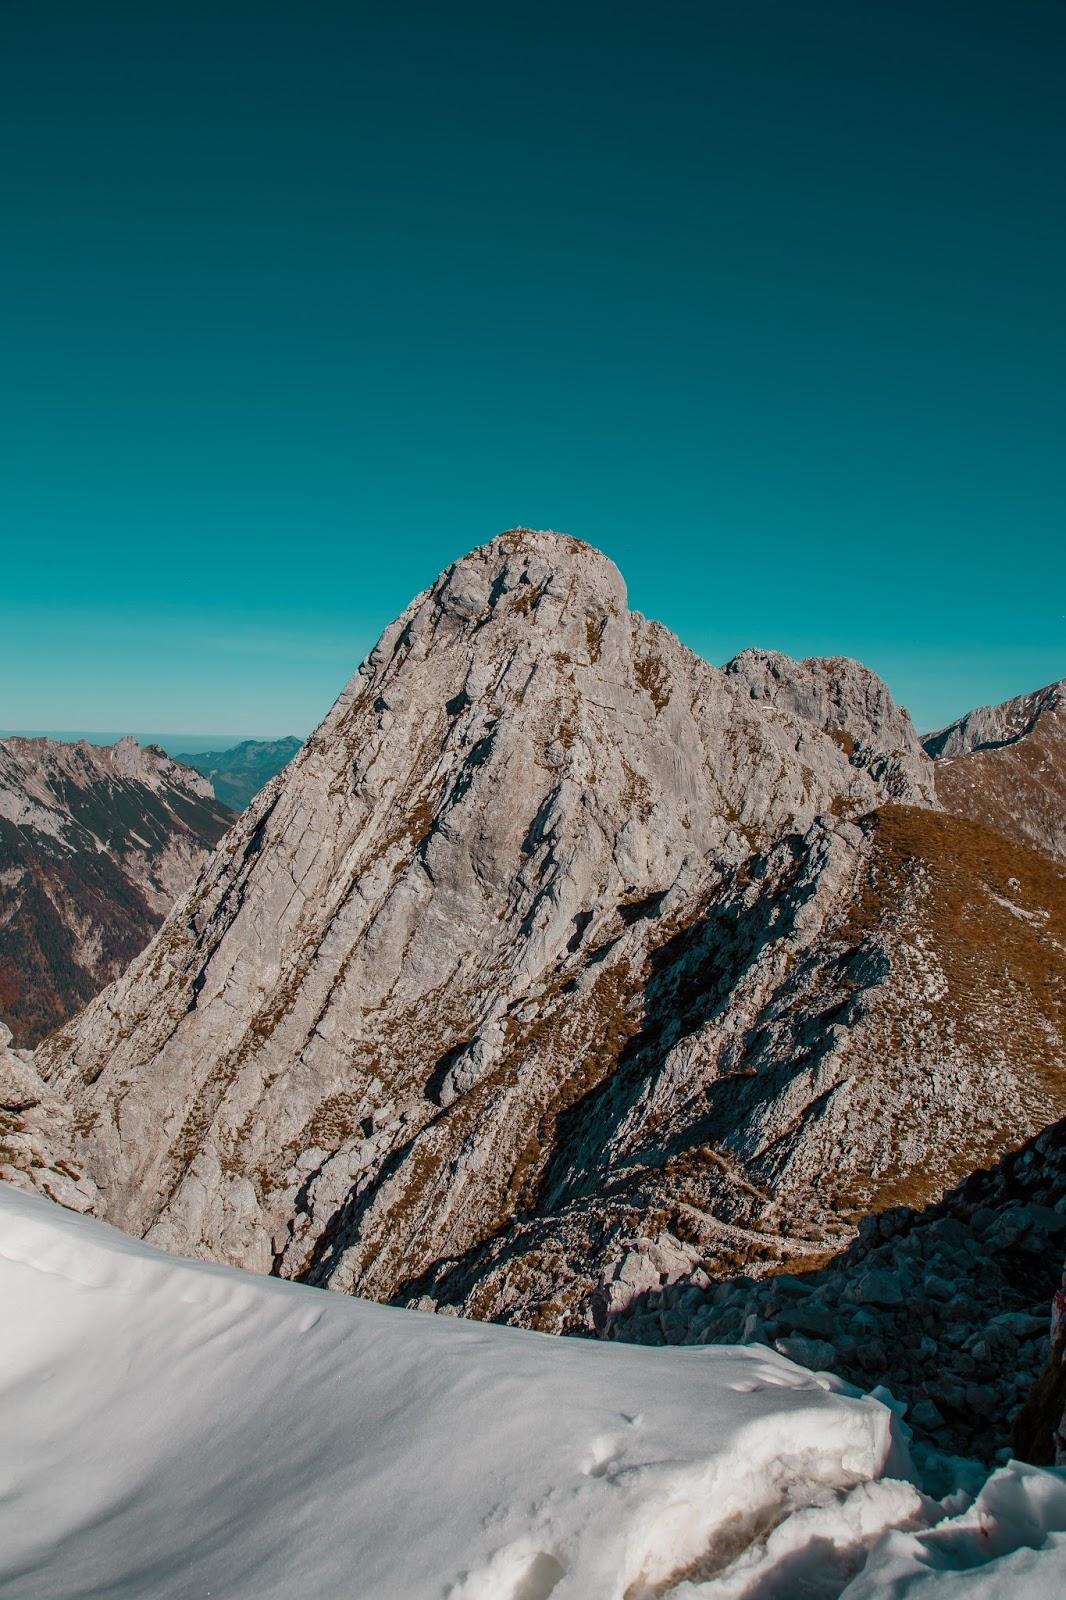 Bergtour Scheffauer  Wandern Wilder Kaiser  leichter Gipfel im Wilden Kaiser  Wandern-Tirol 13